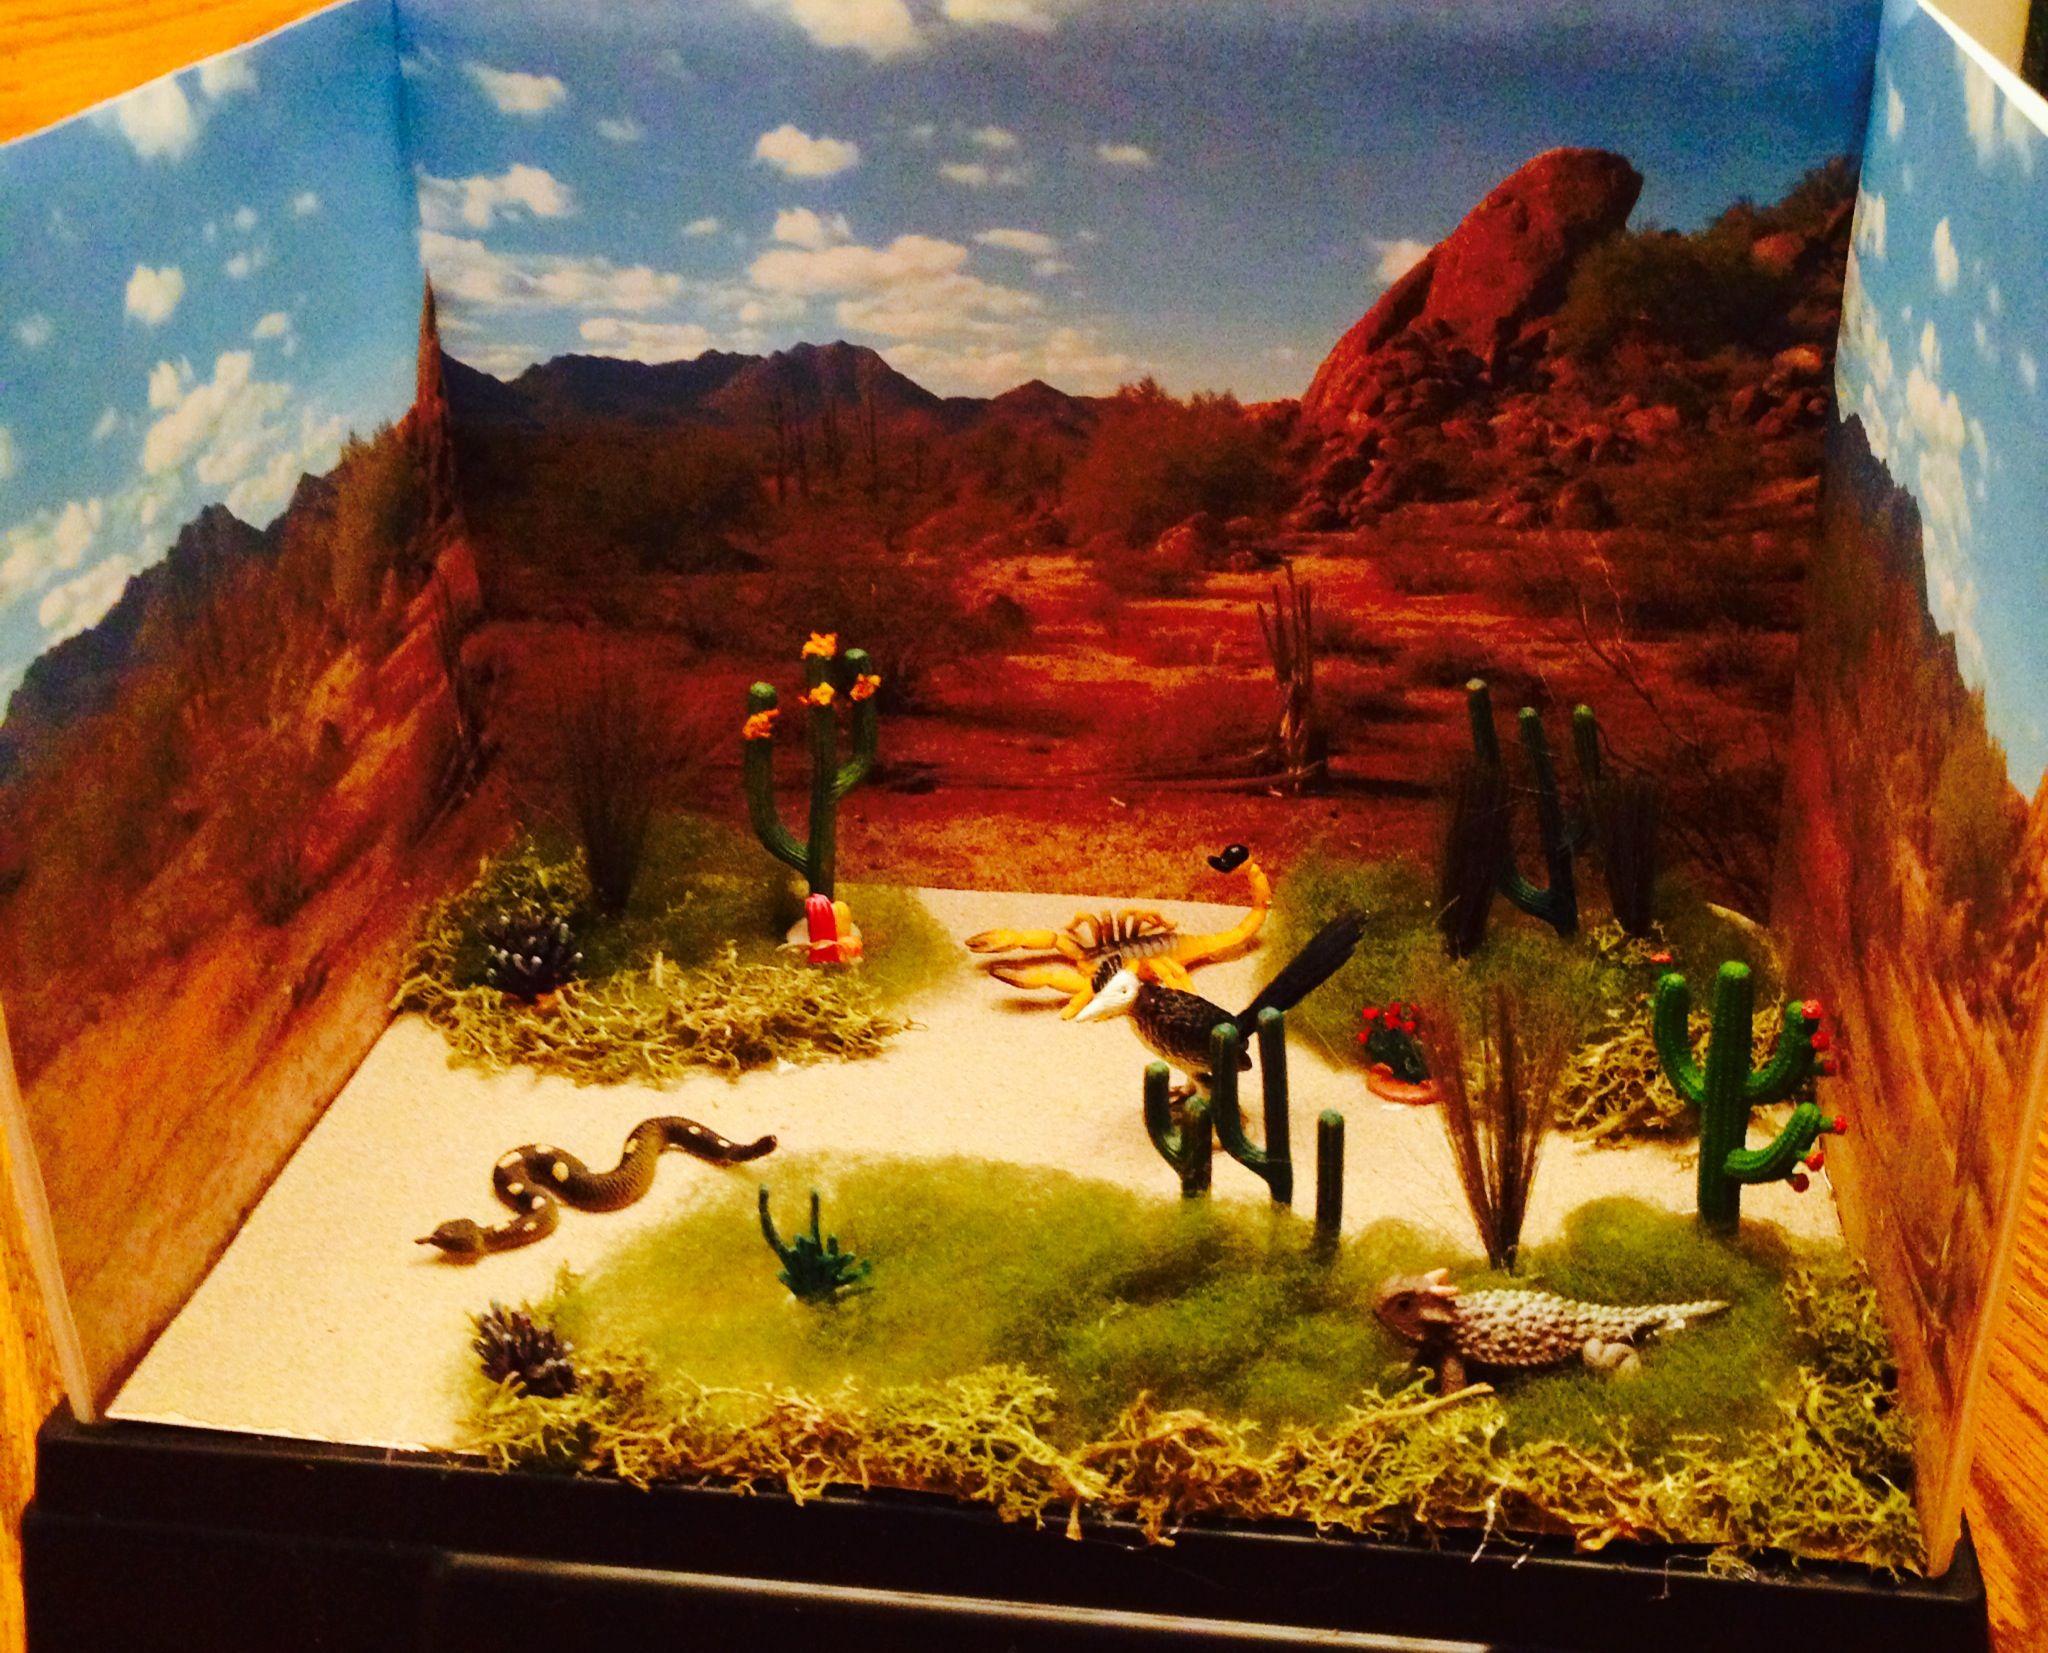 3d School Projects Desert Diorama Habitats Projects Ecosystems Diorama [ 1653 x 2048 Pixel ]